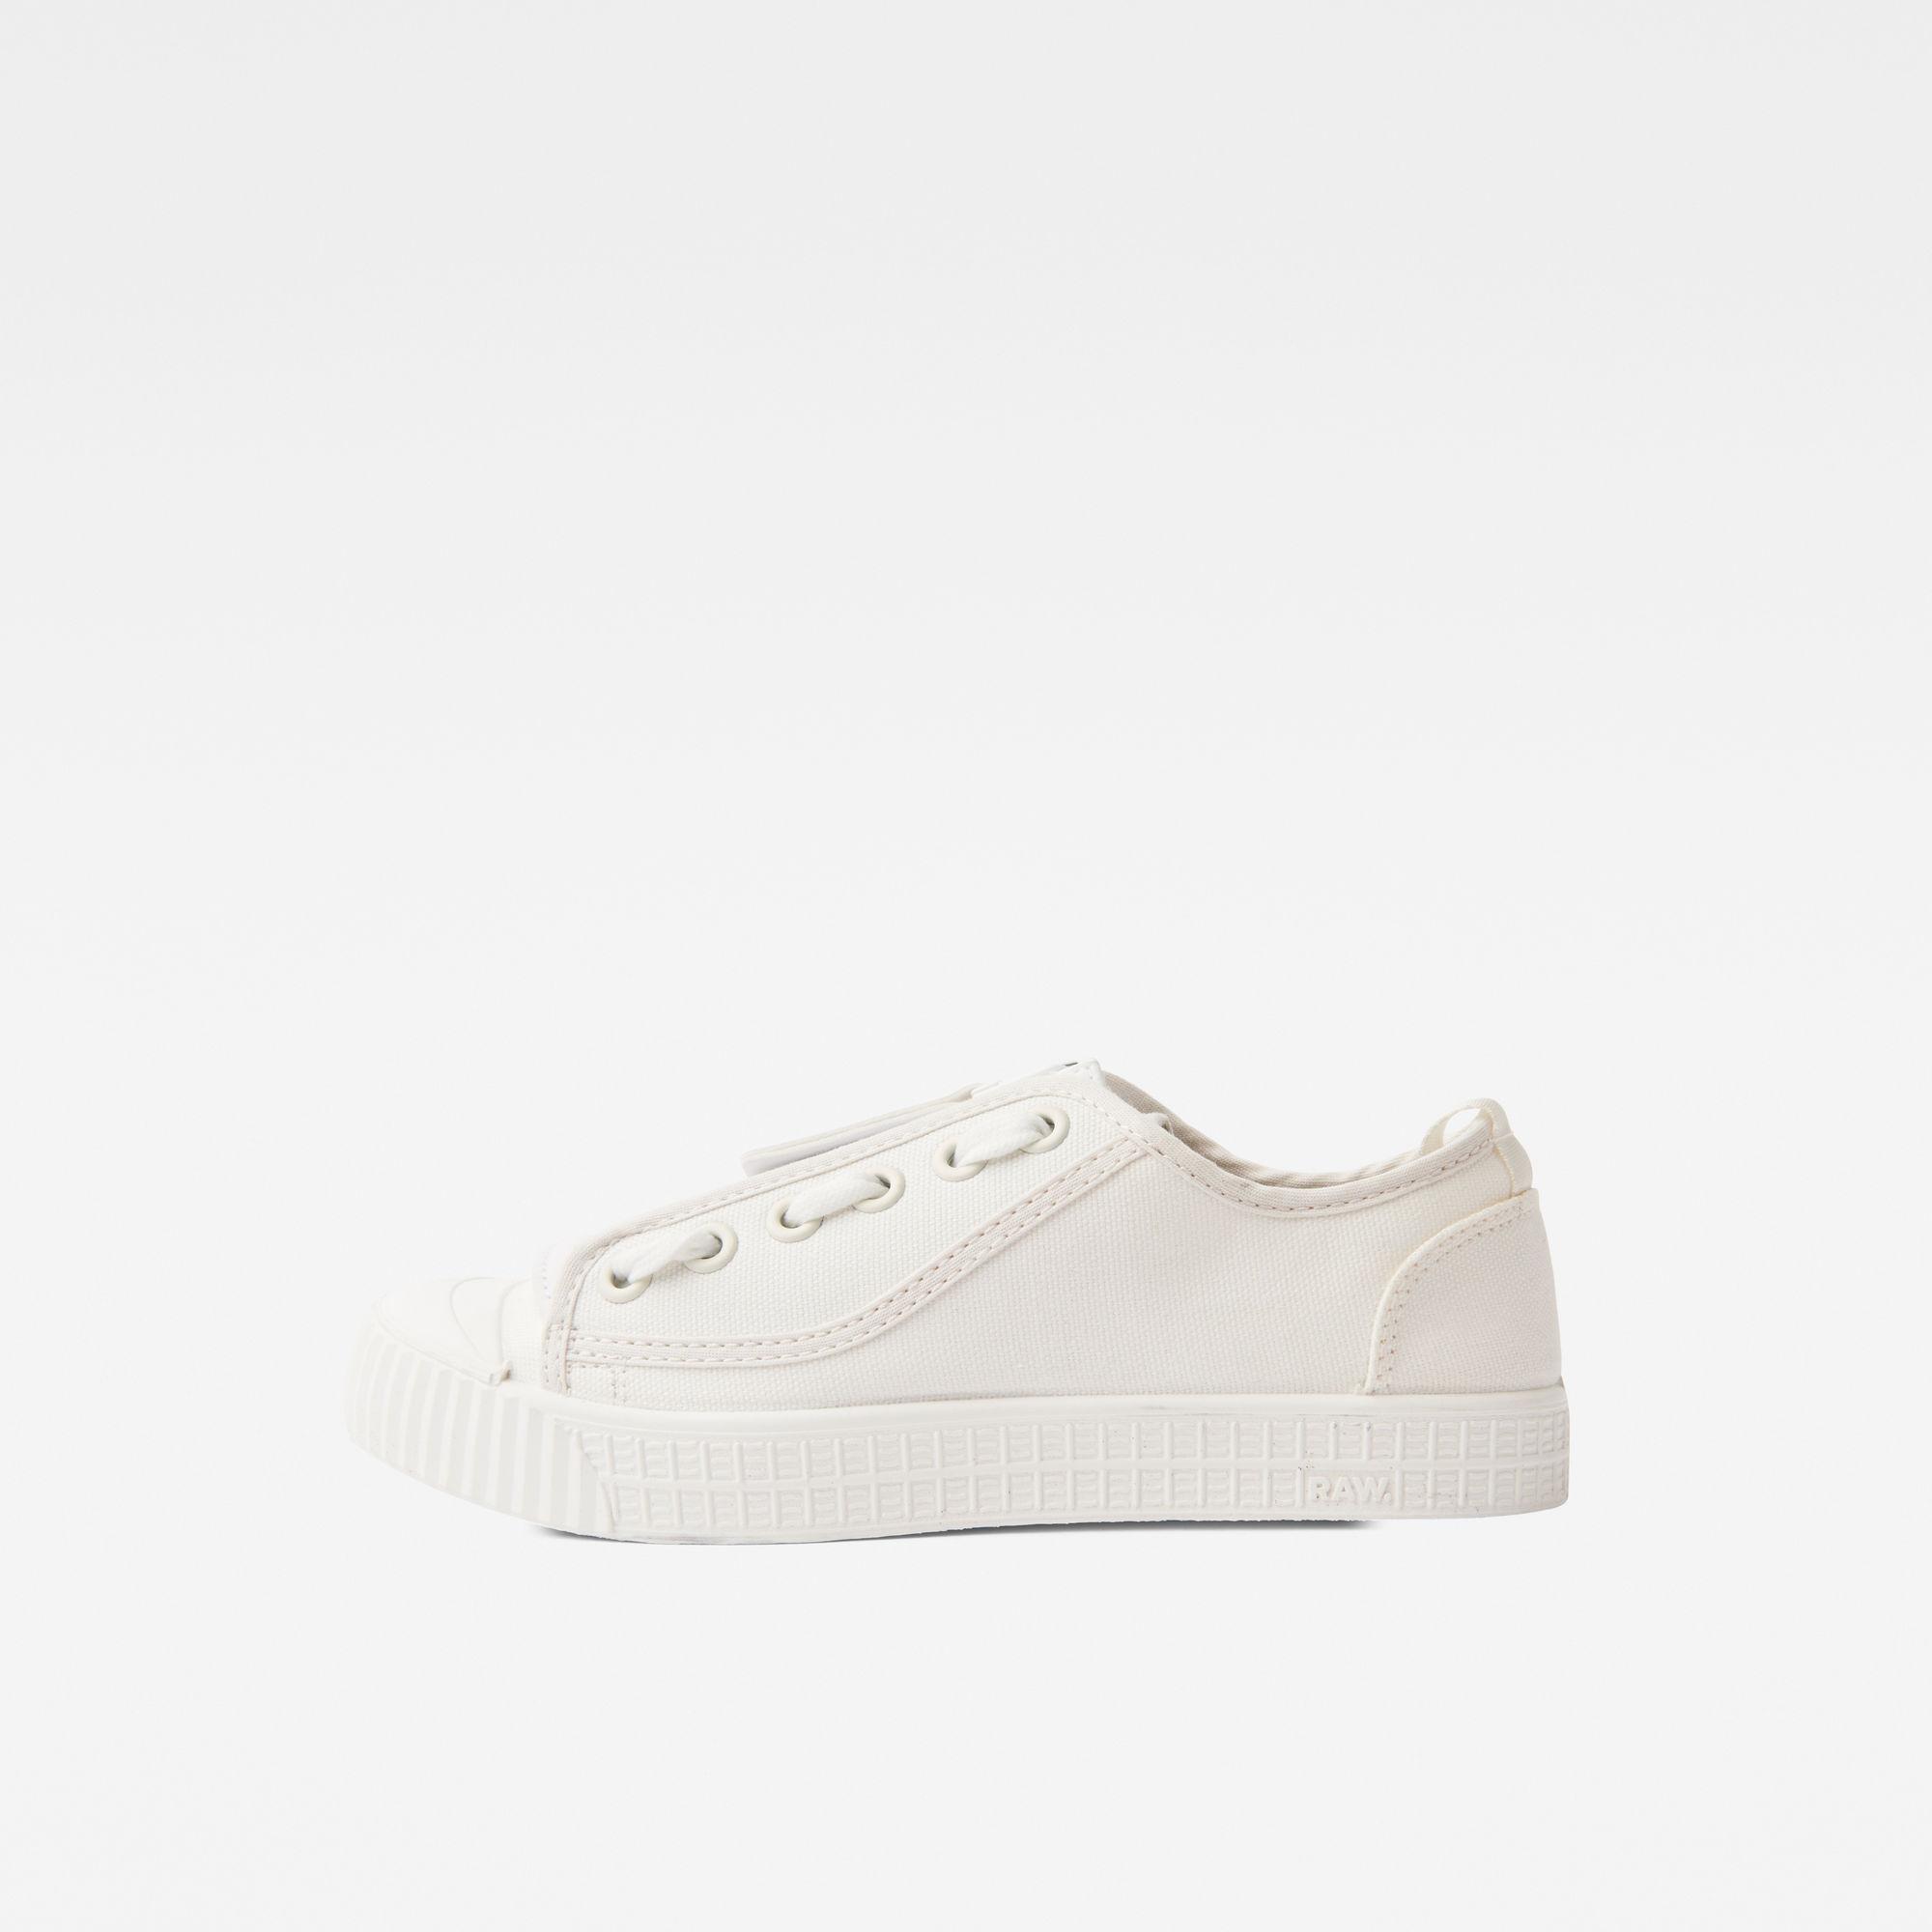 Image of G Star Raw Rovulc Zip Low Sneakers